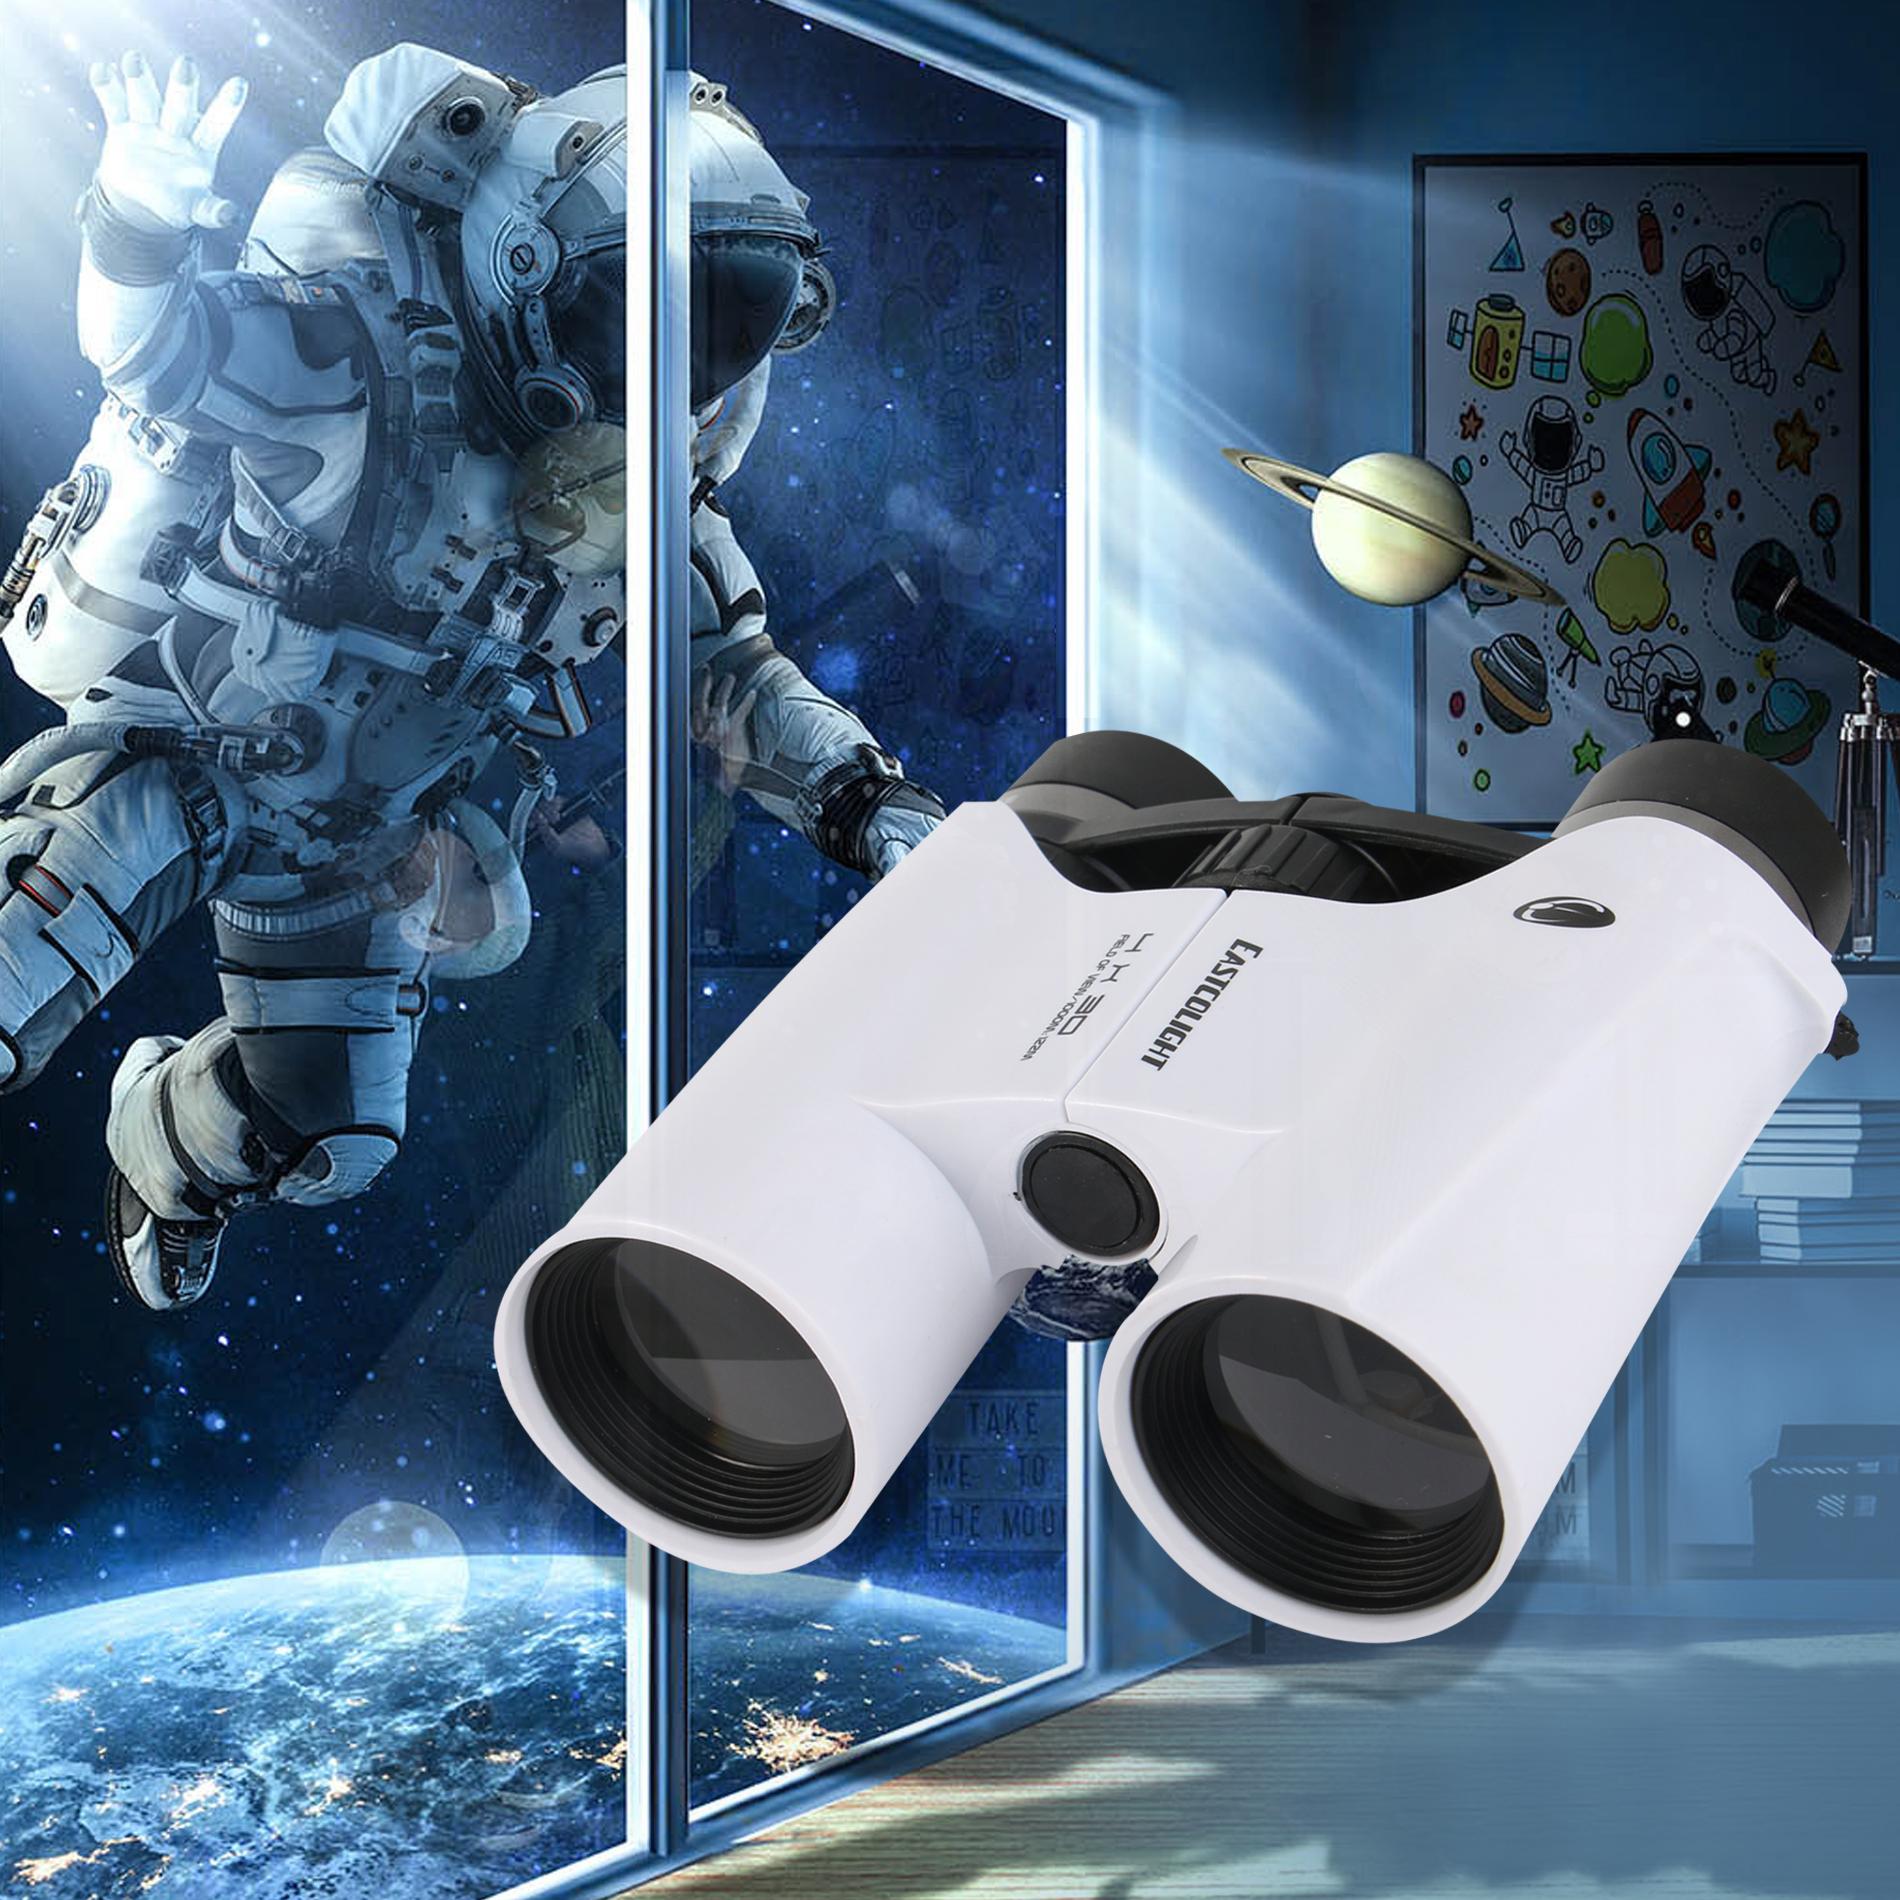 Black Kids Telescopes Handheld Toy Binoculars Telescope Fun Cool Learning Exploring Educational Toy Gift for Kids Boys Girls 3-8 Years